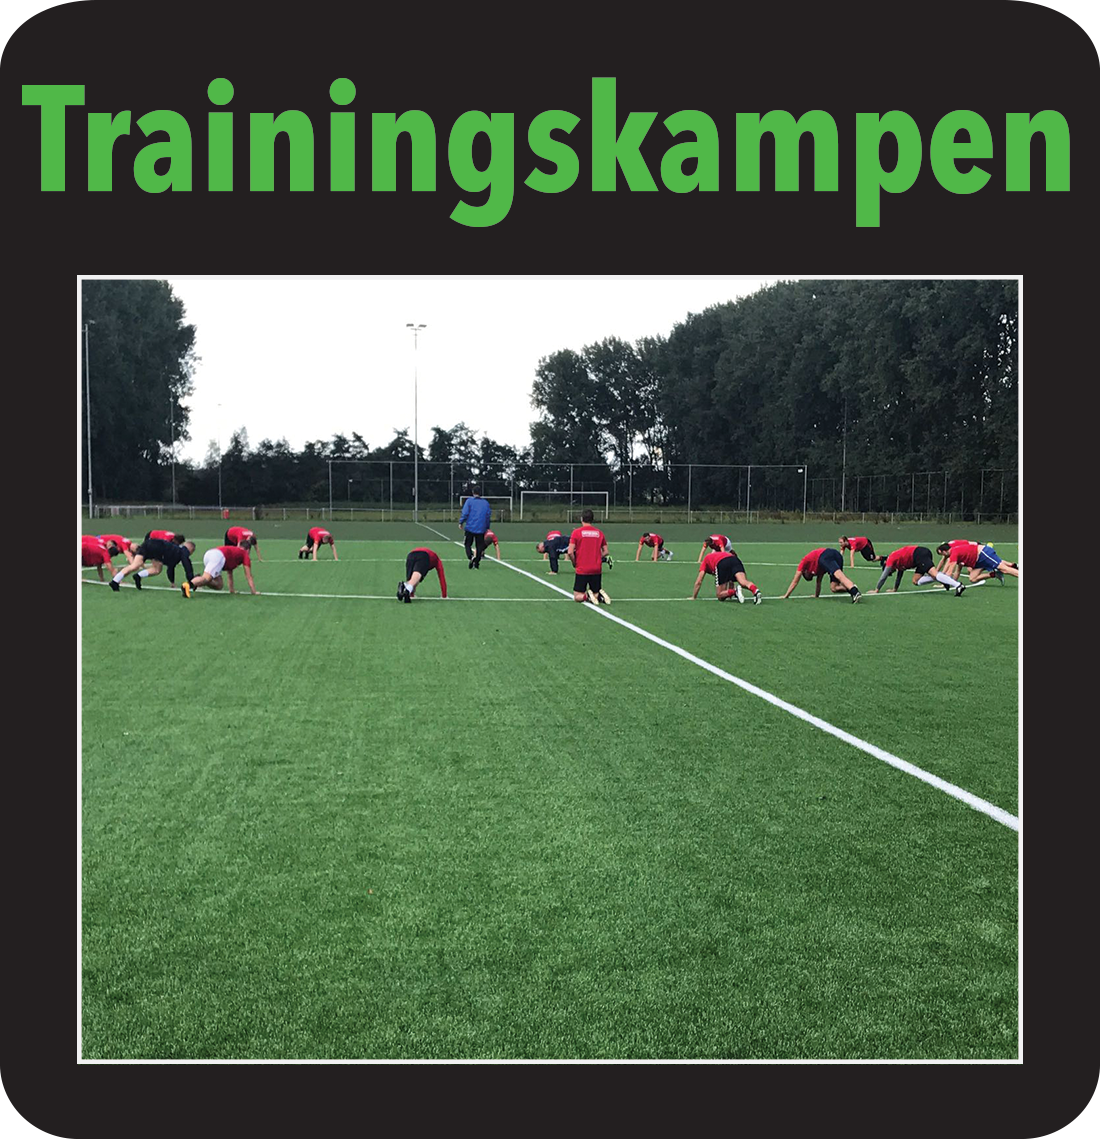 Trainingskamp in Nederland